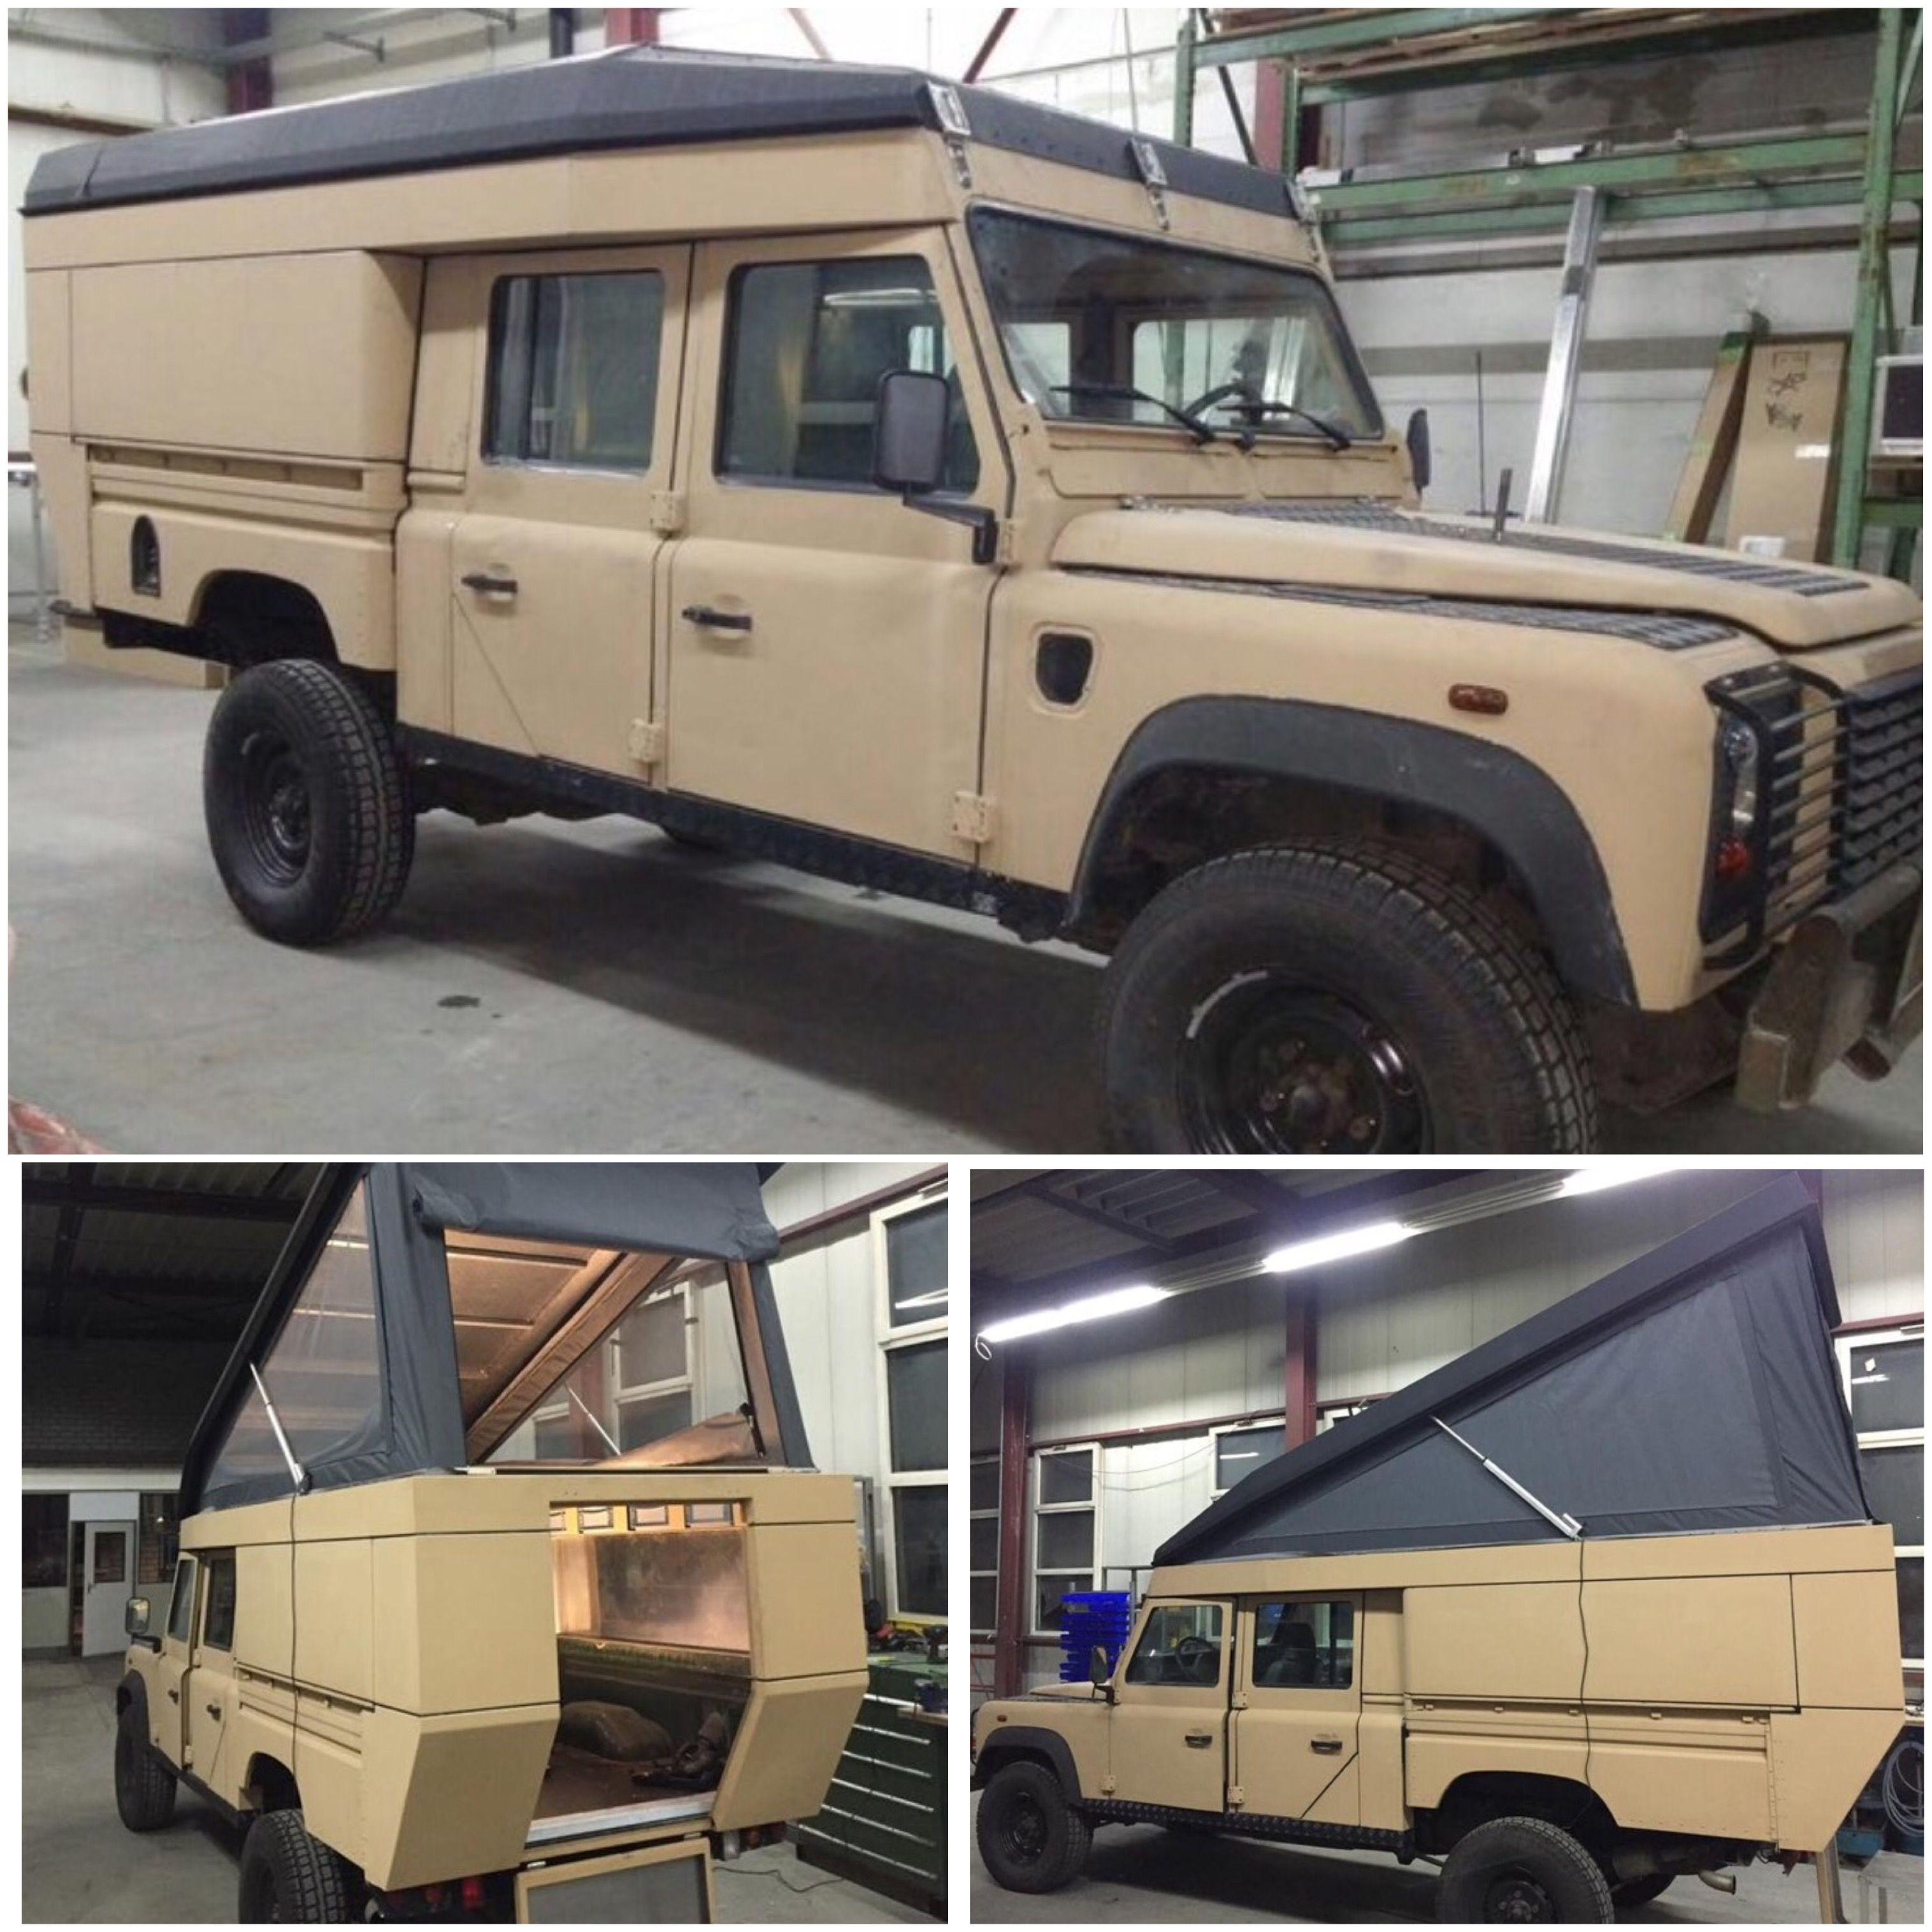 Land Rover Defender 110 Td5 Caravan Convert Land Rover Defender